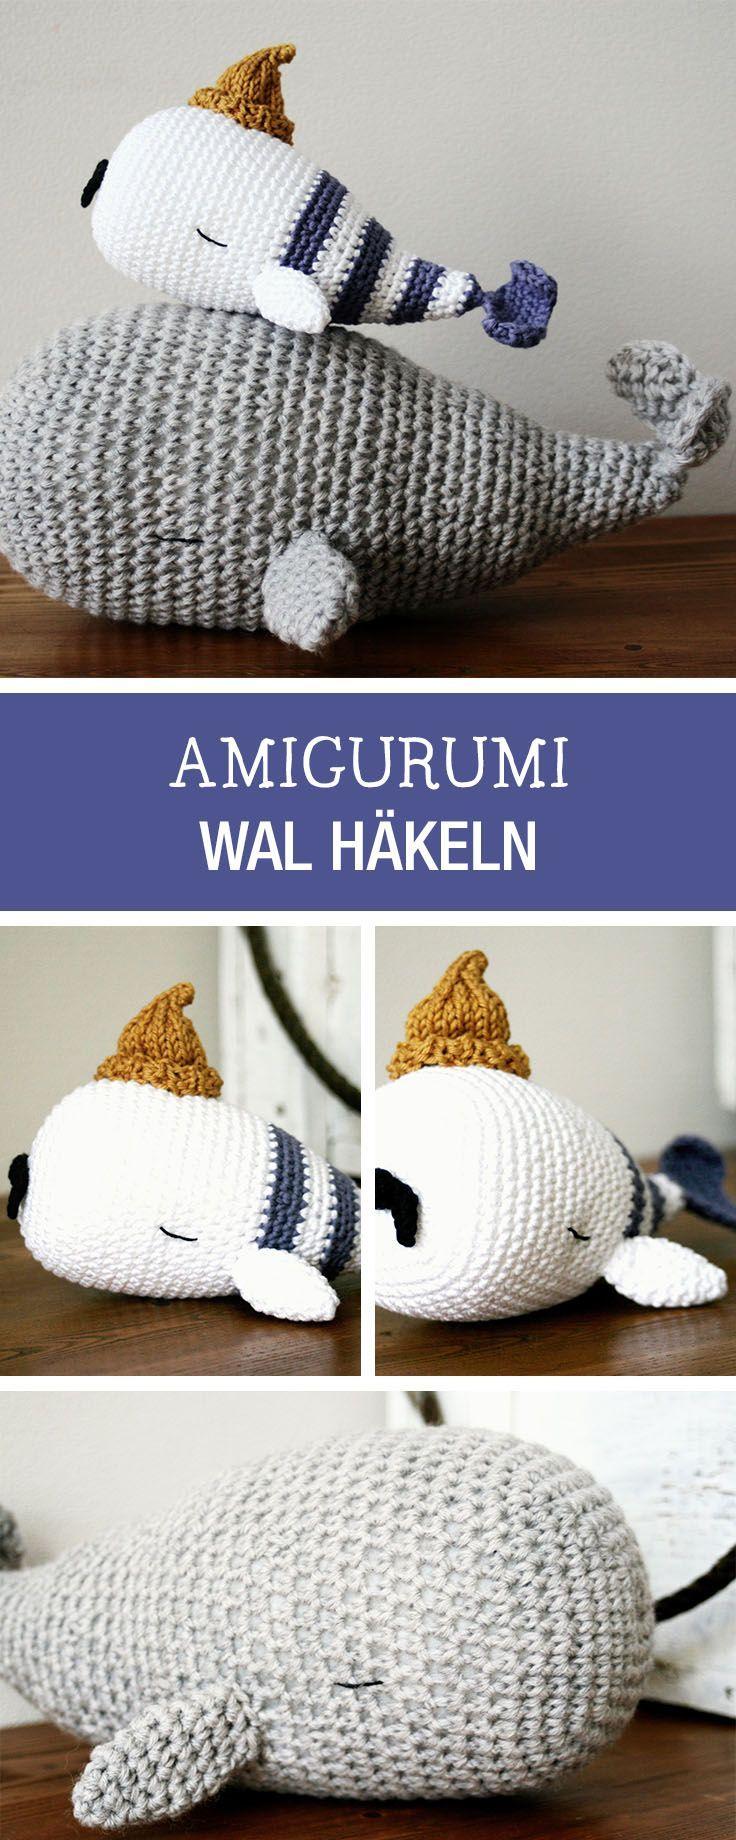 Diy Anleitung Amigurumi Wal Häkeln Maritime Wohndeko Spielzeug